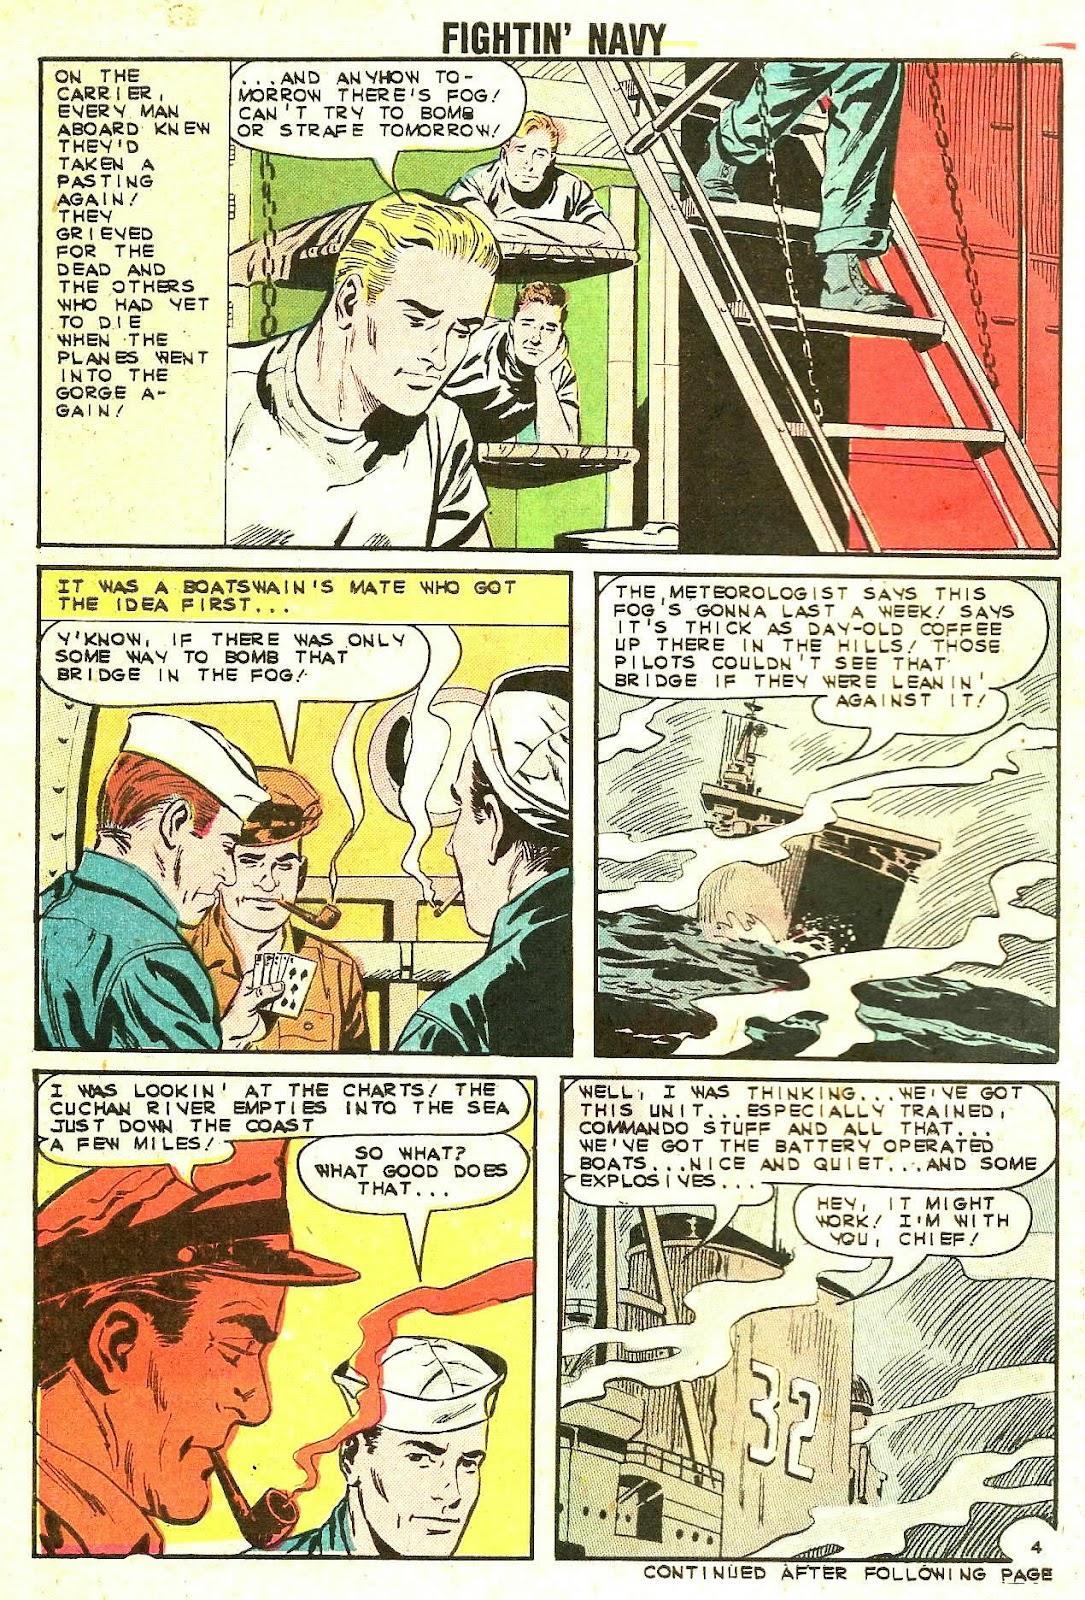 Read online Fightin' Navy comic -  Issue #110 - 30